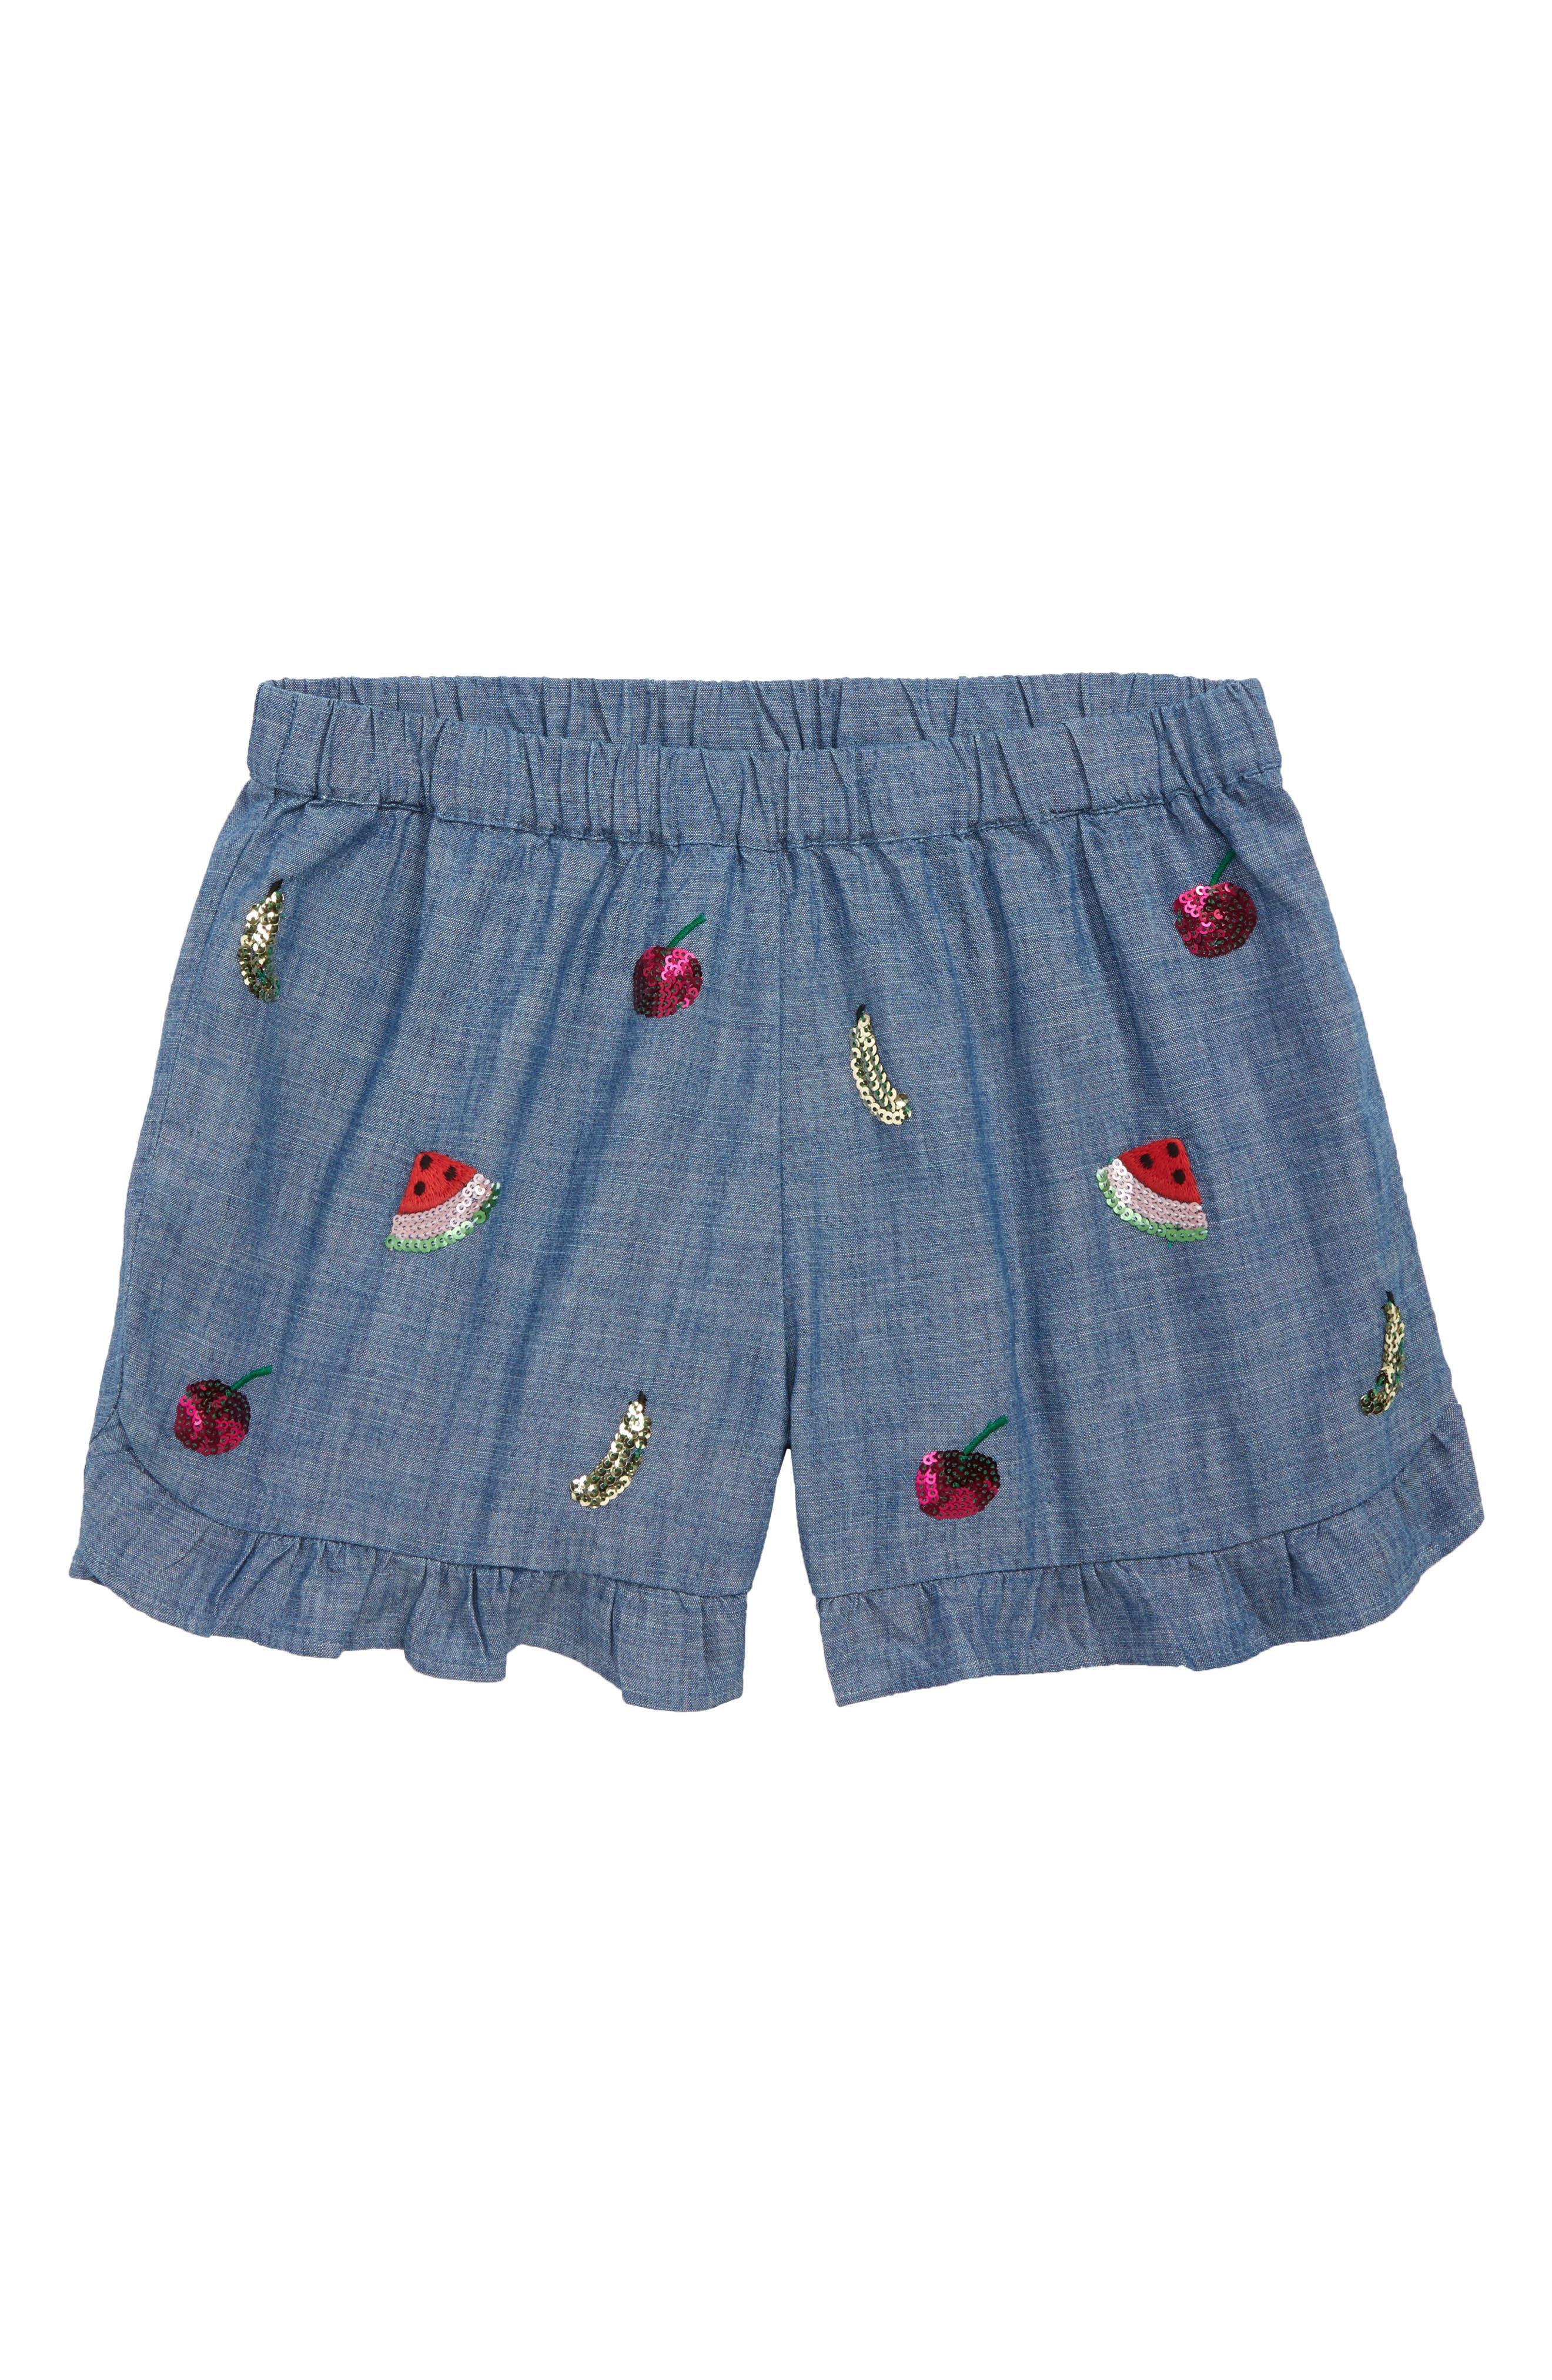 fecb3b315e Girls  Crewcuts By J.Crew Shorts 2T-6X  Jean   Velvet